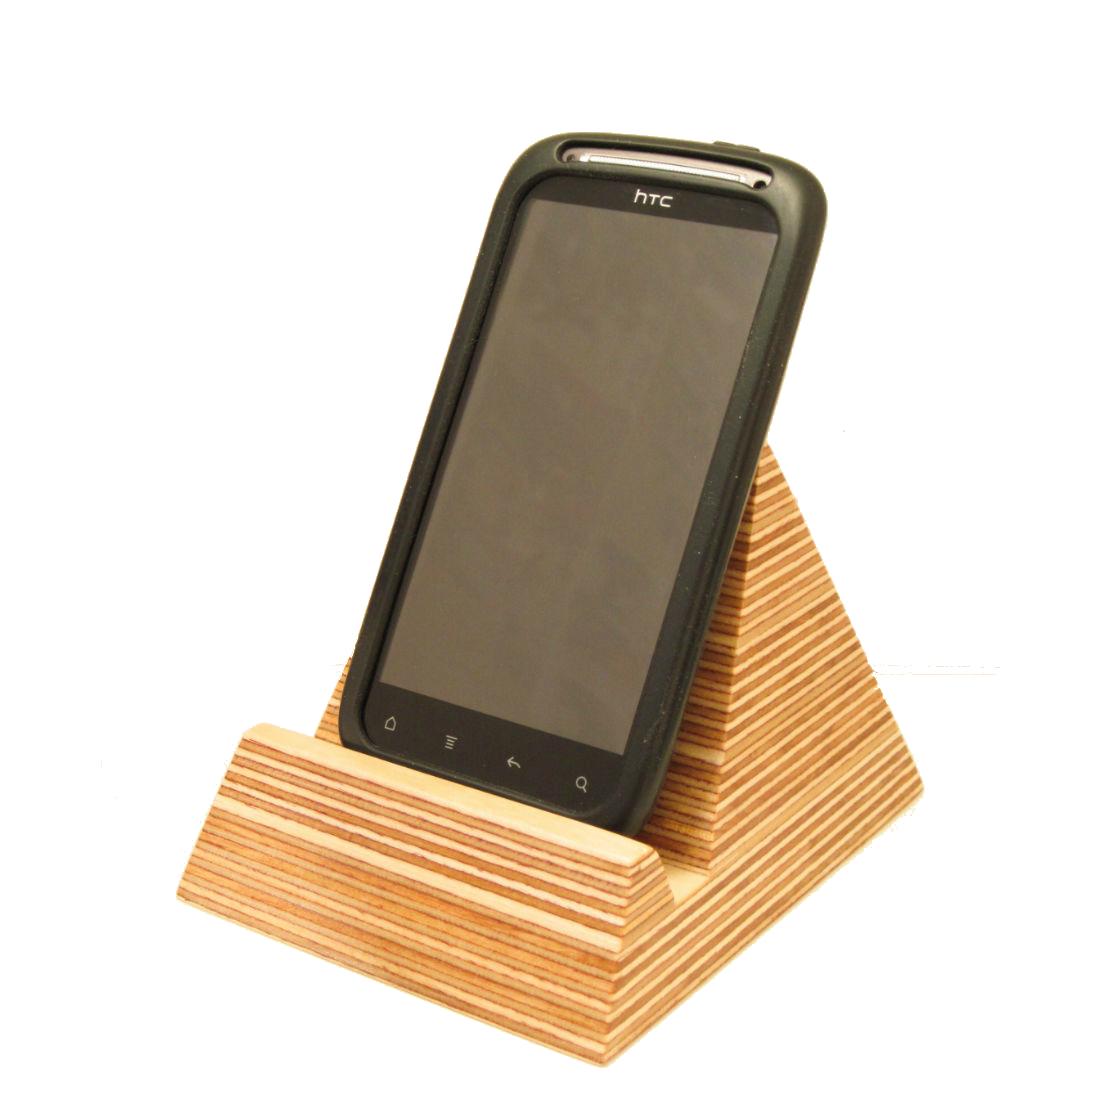 Pyramid Phone Holder Homeware Furniture And Gifts Mocha